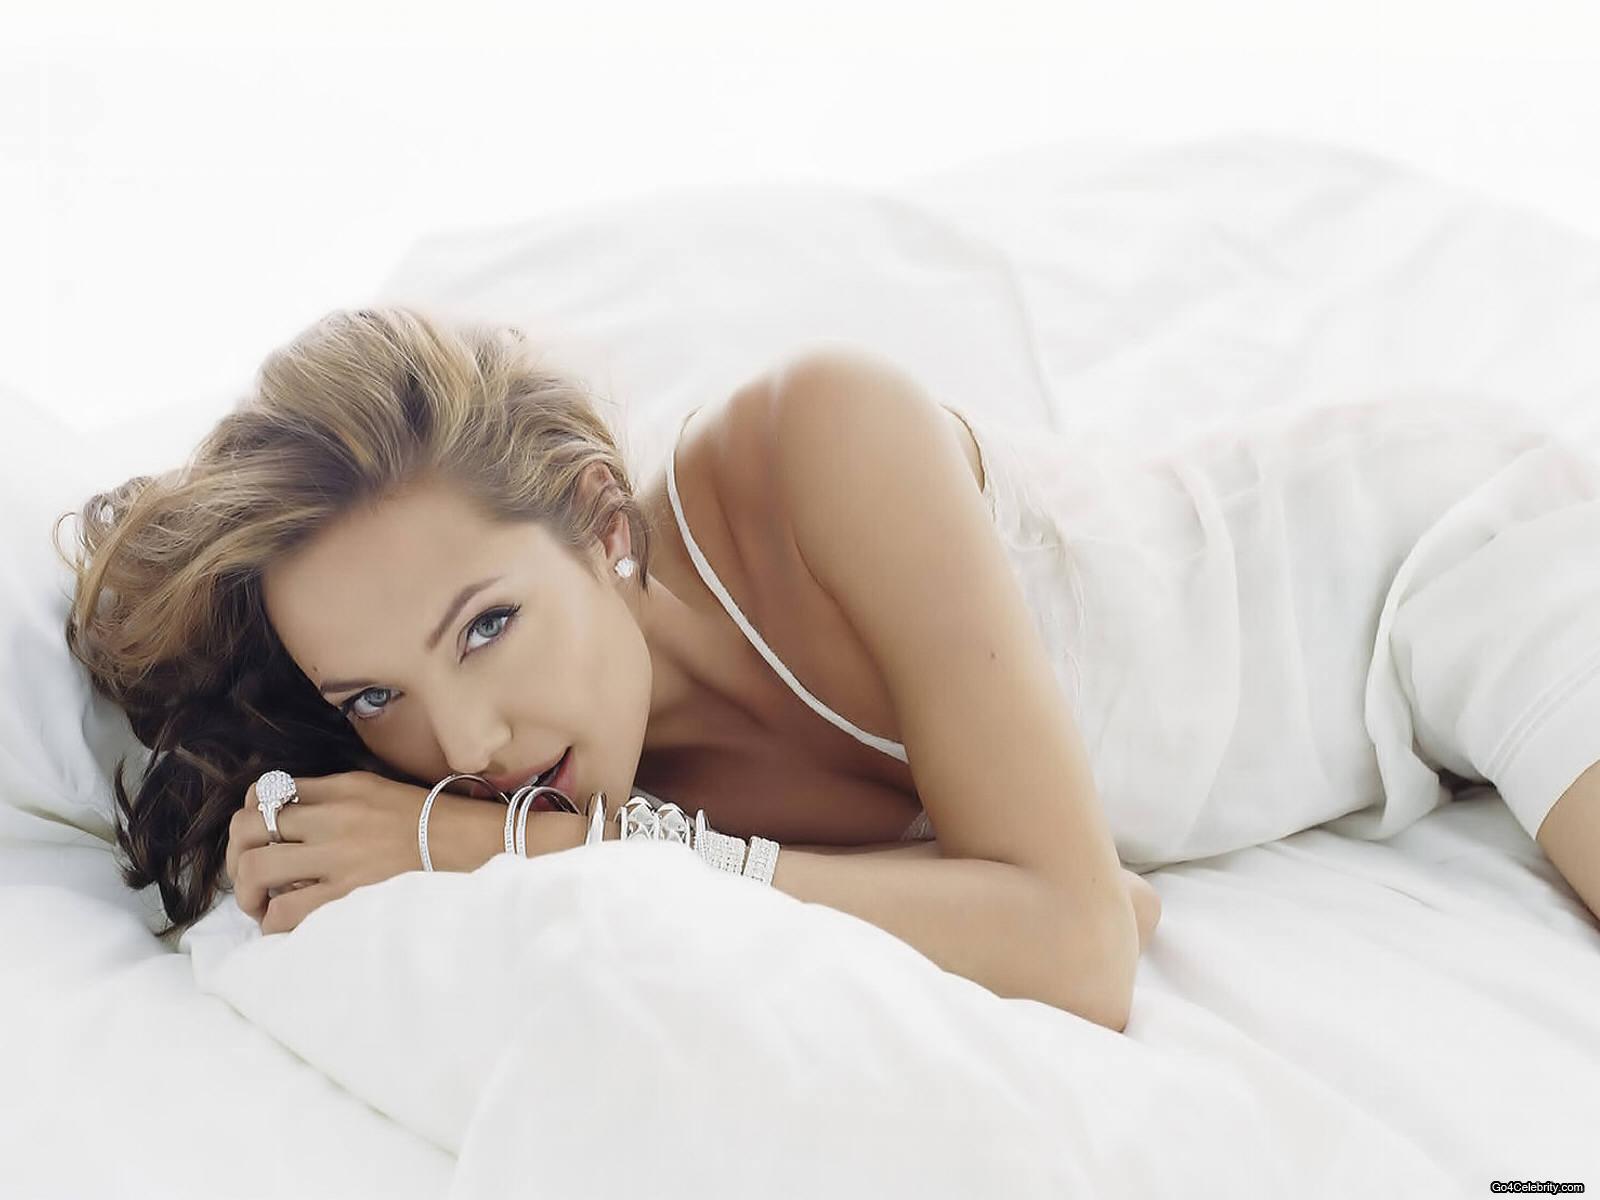 http://1.bp.blogspot.com/-nPp6w5bpyVA/T7yP_2BMBgI/AAAAAAAAC_c/S2GupCeUw7U/s1600/Angelina+Jolie+-+Wallpaper+%281%29.jpg